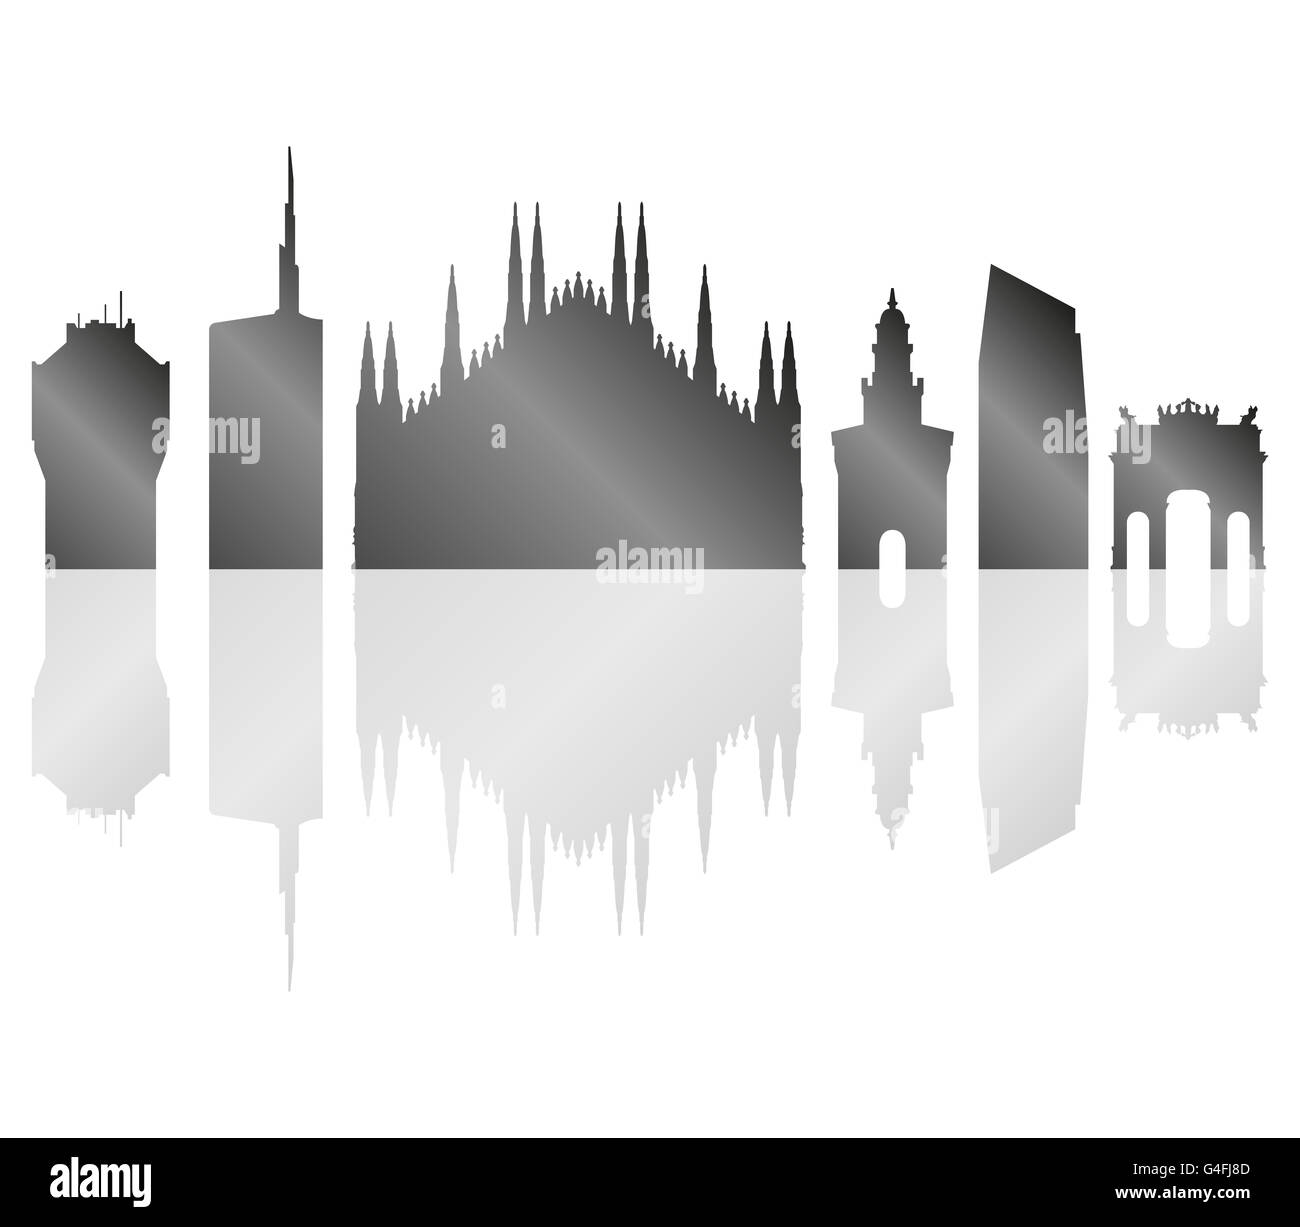 milano skyline - Stock Image